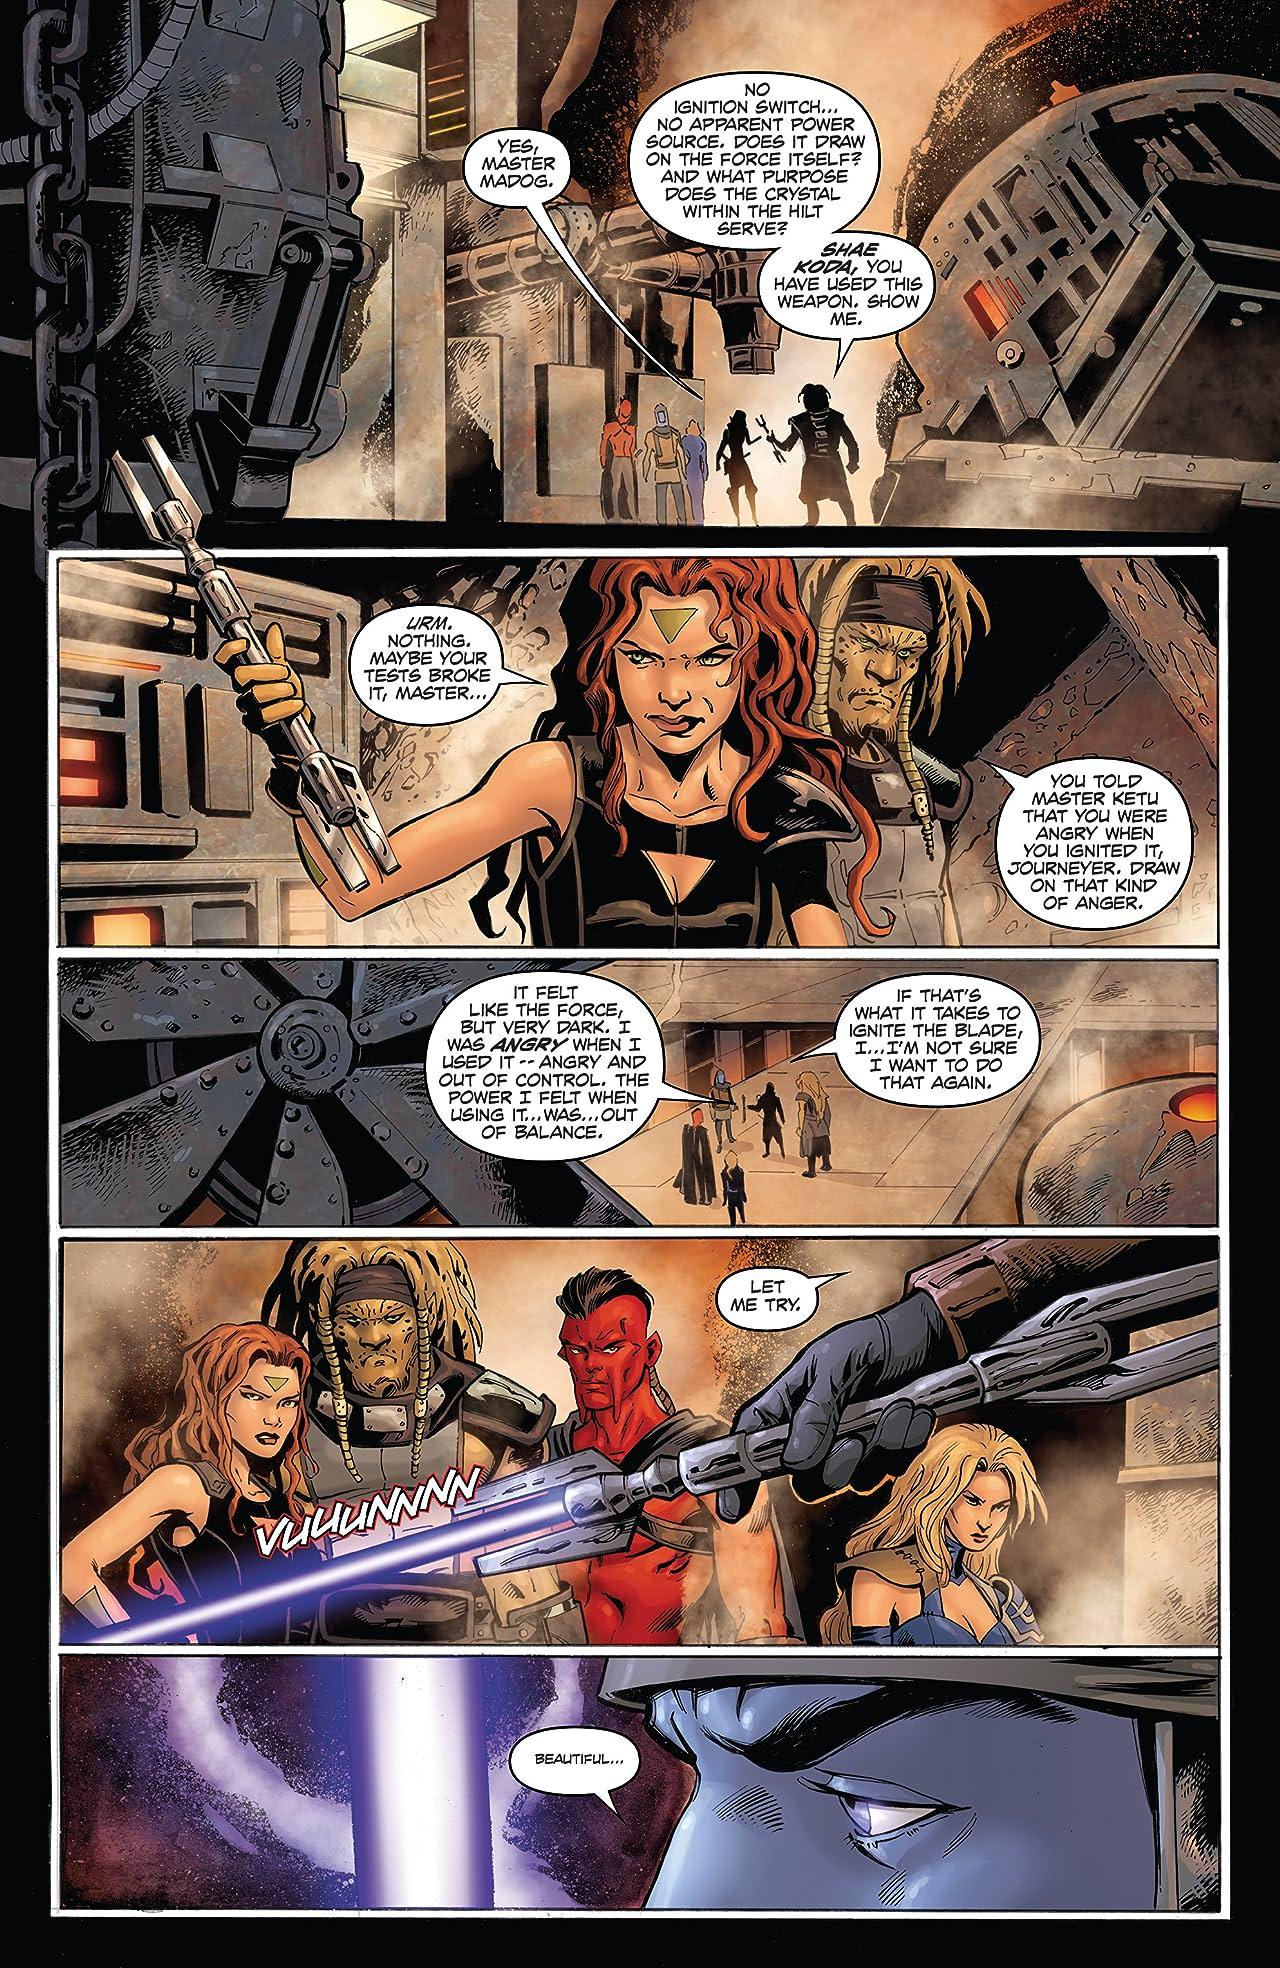 Star Wars: Dawn Of The Jedi - The Prisoner Of Bogan (2012-2013) #2 (of 5)